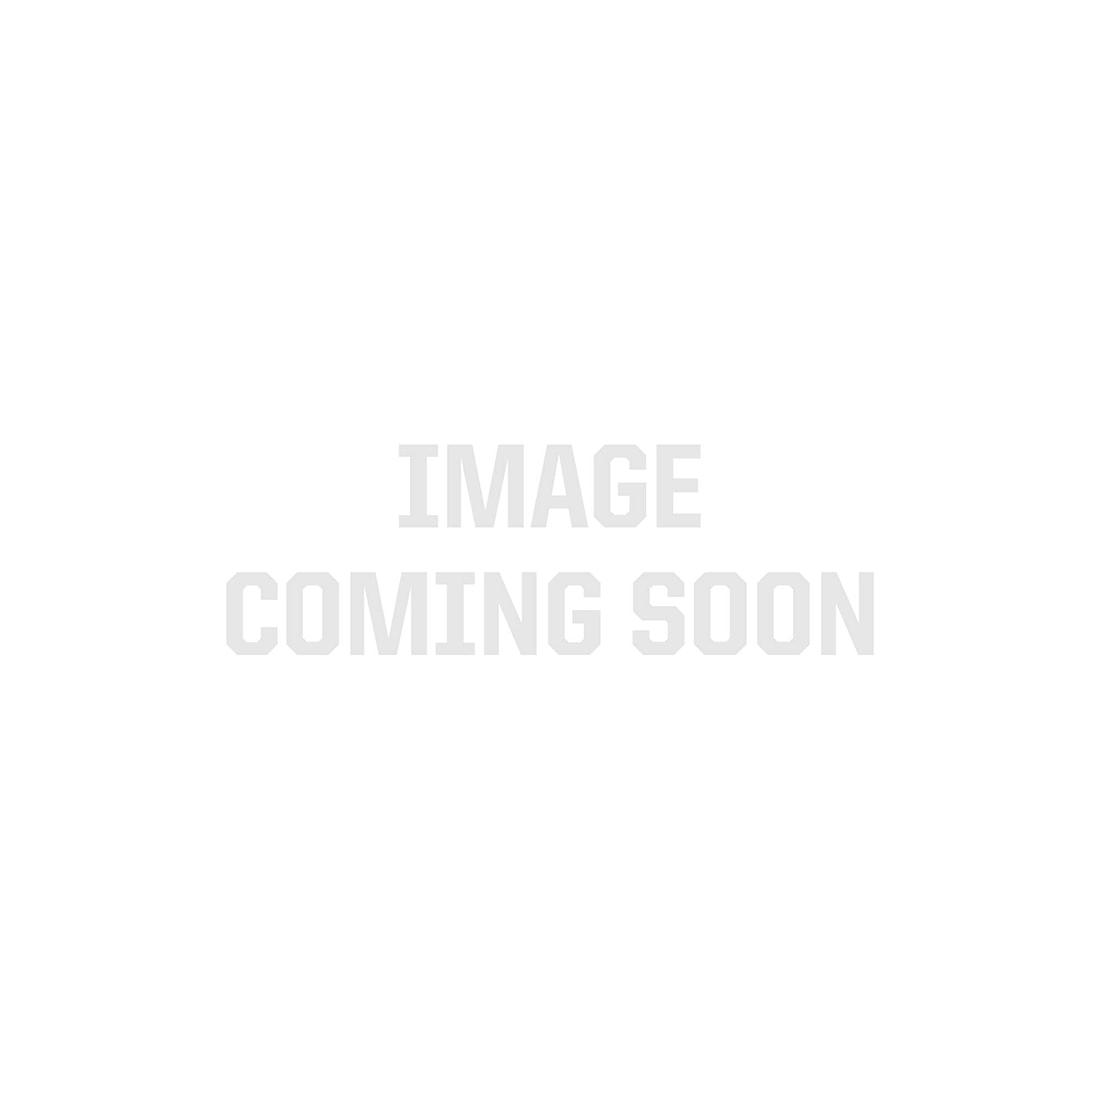 Blue 3528 Quad Row LED Strip Light, 450/m, 28mm wide, Sample Kit